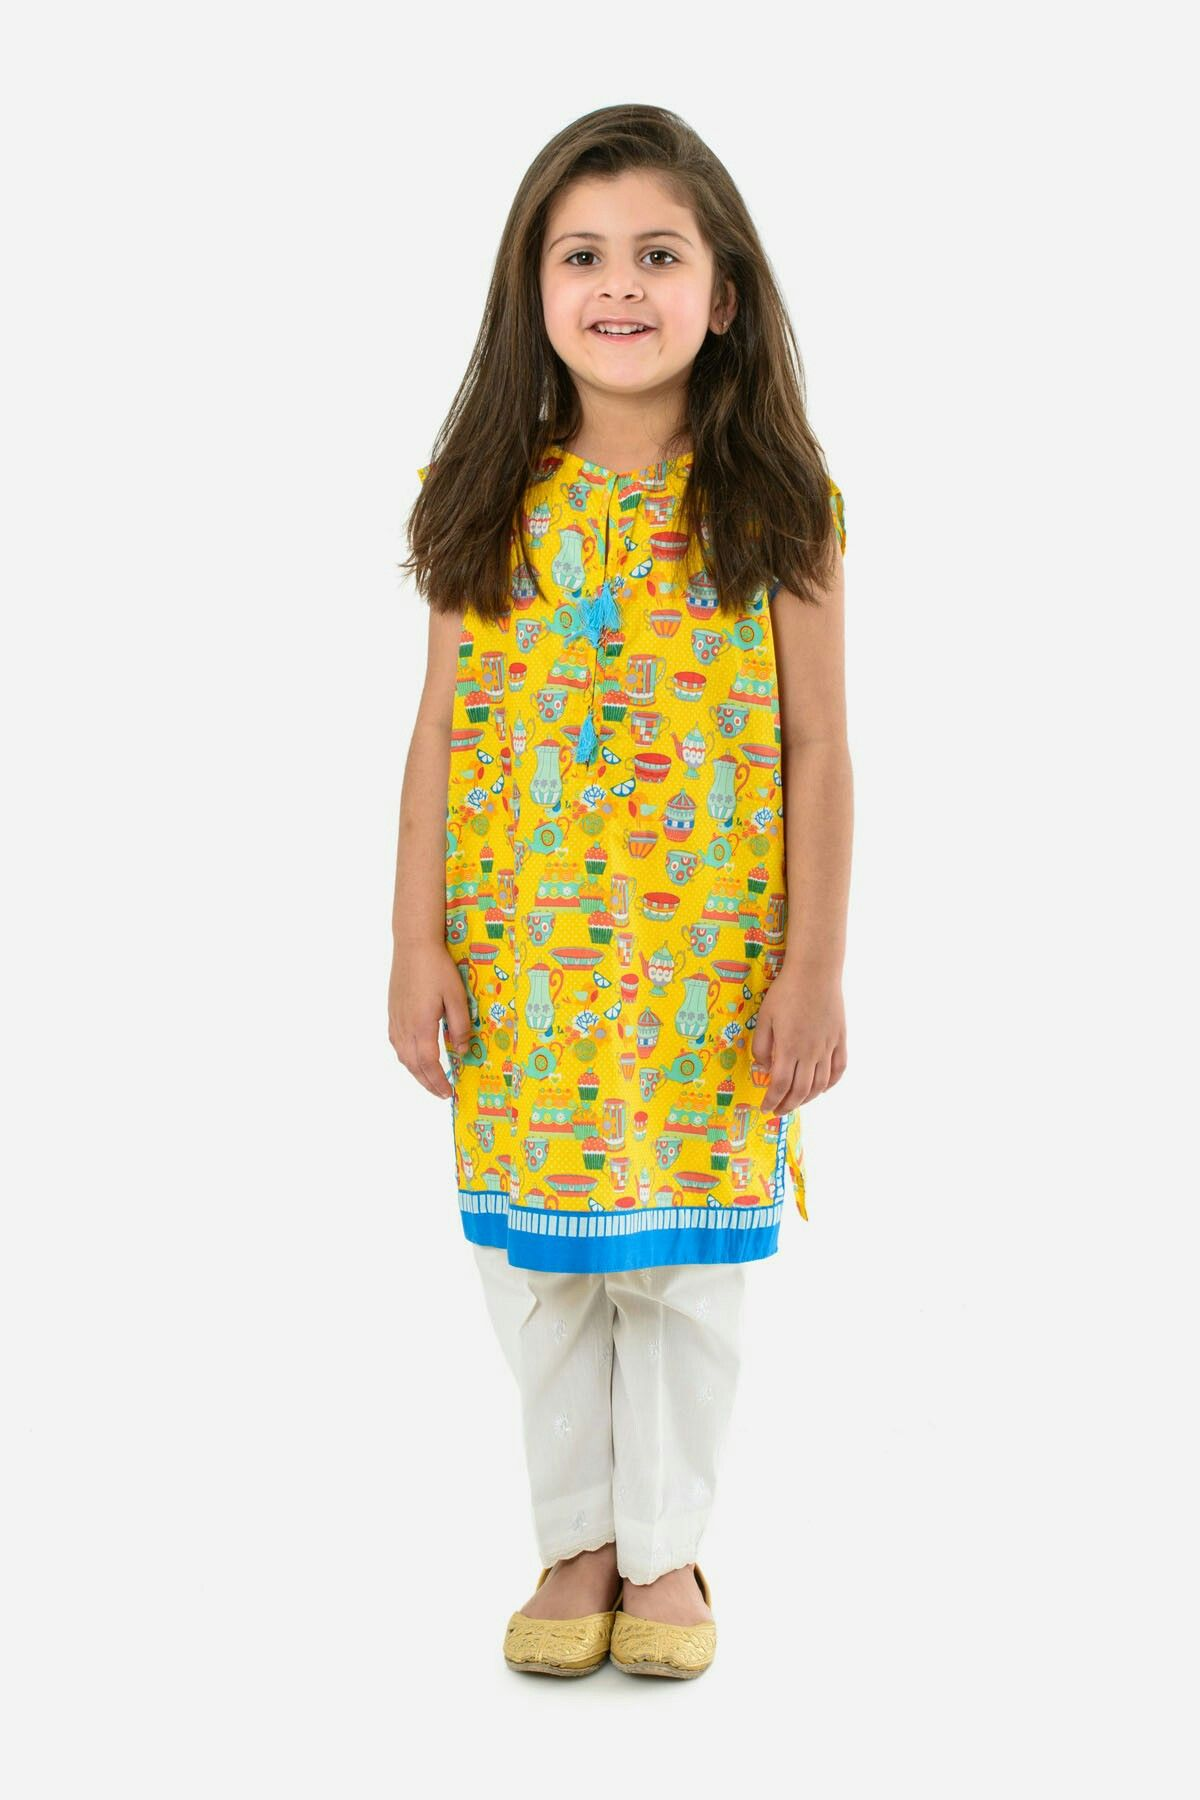 02e04a97c4ea8 Khaadi kids pakistan | girl dress | Dresses kids girl, Baby girl ...